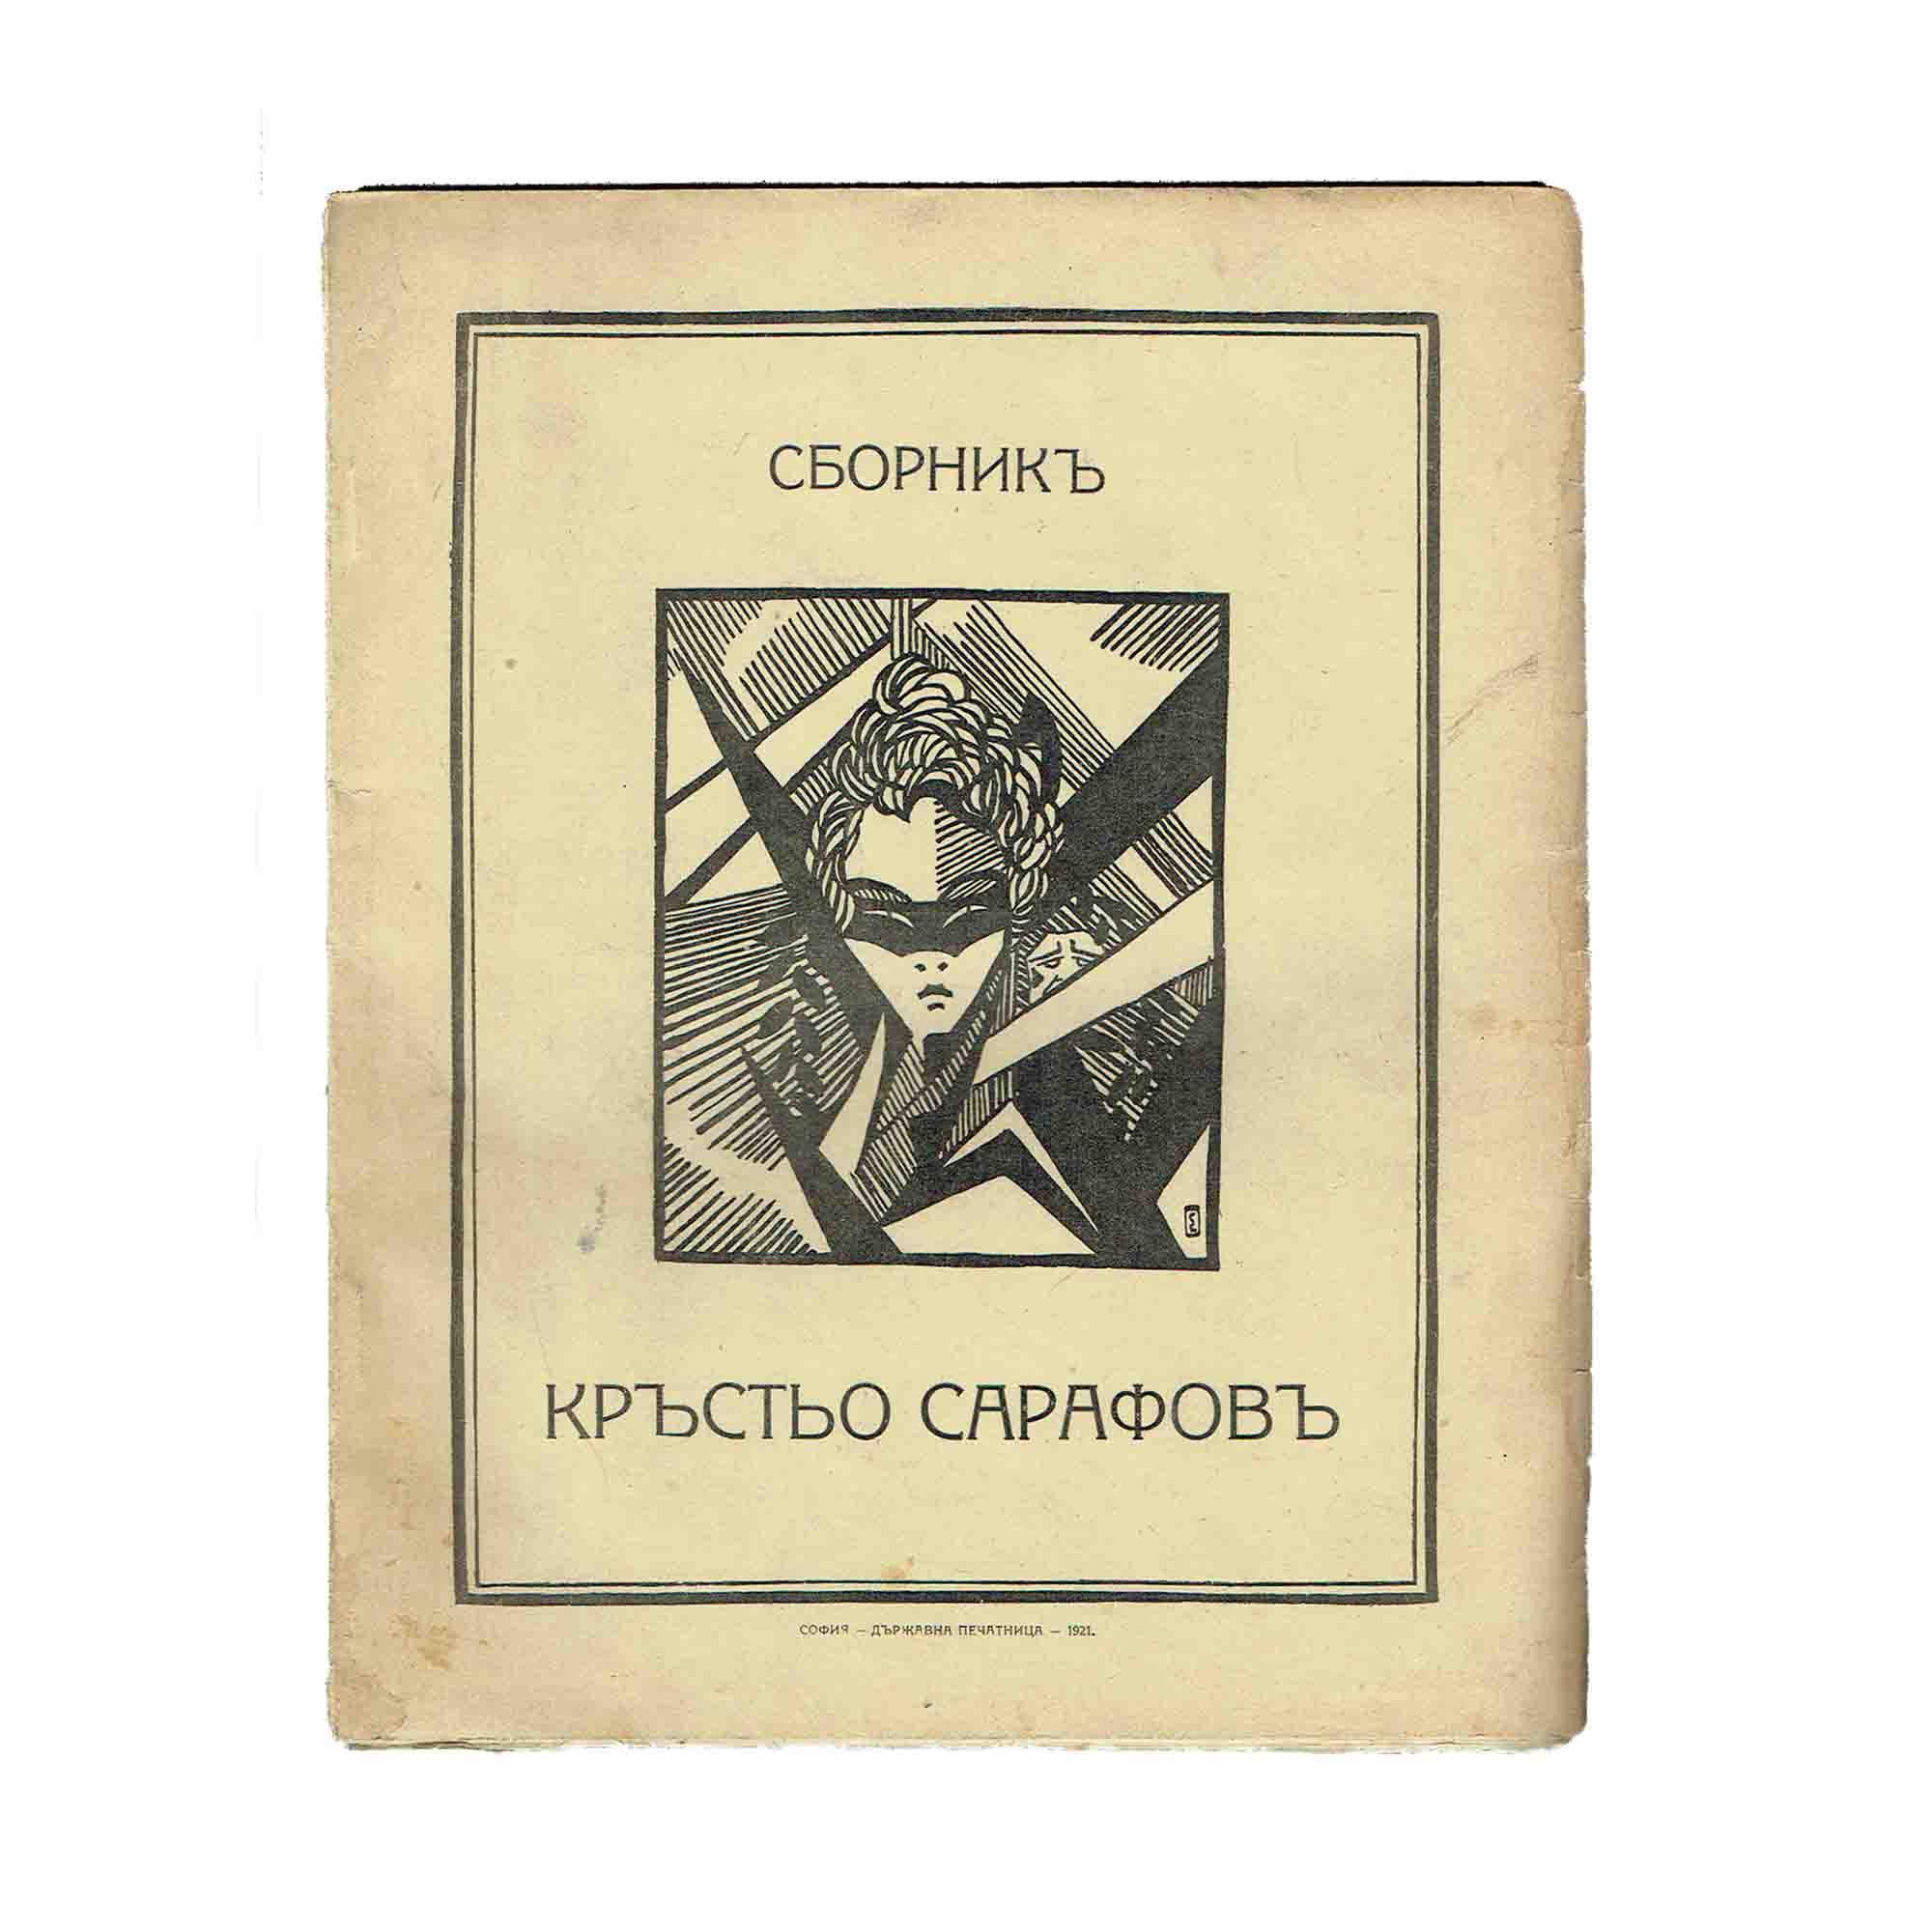 5401-Sarafov-Skitnik-Sbornik-1921-Umschlag-frei-N.jpg